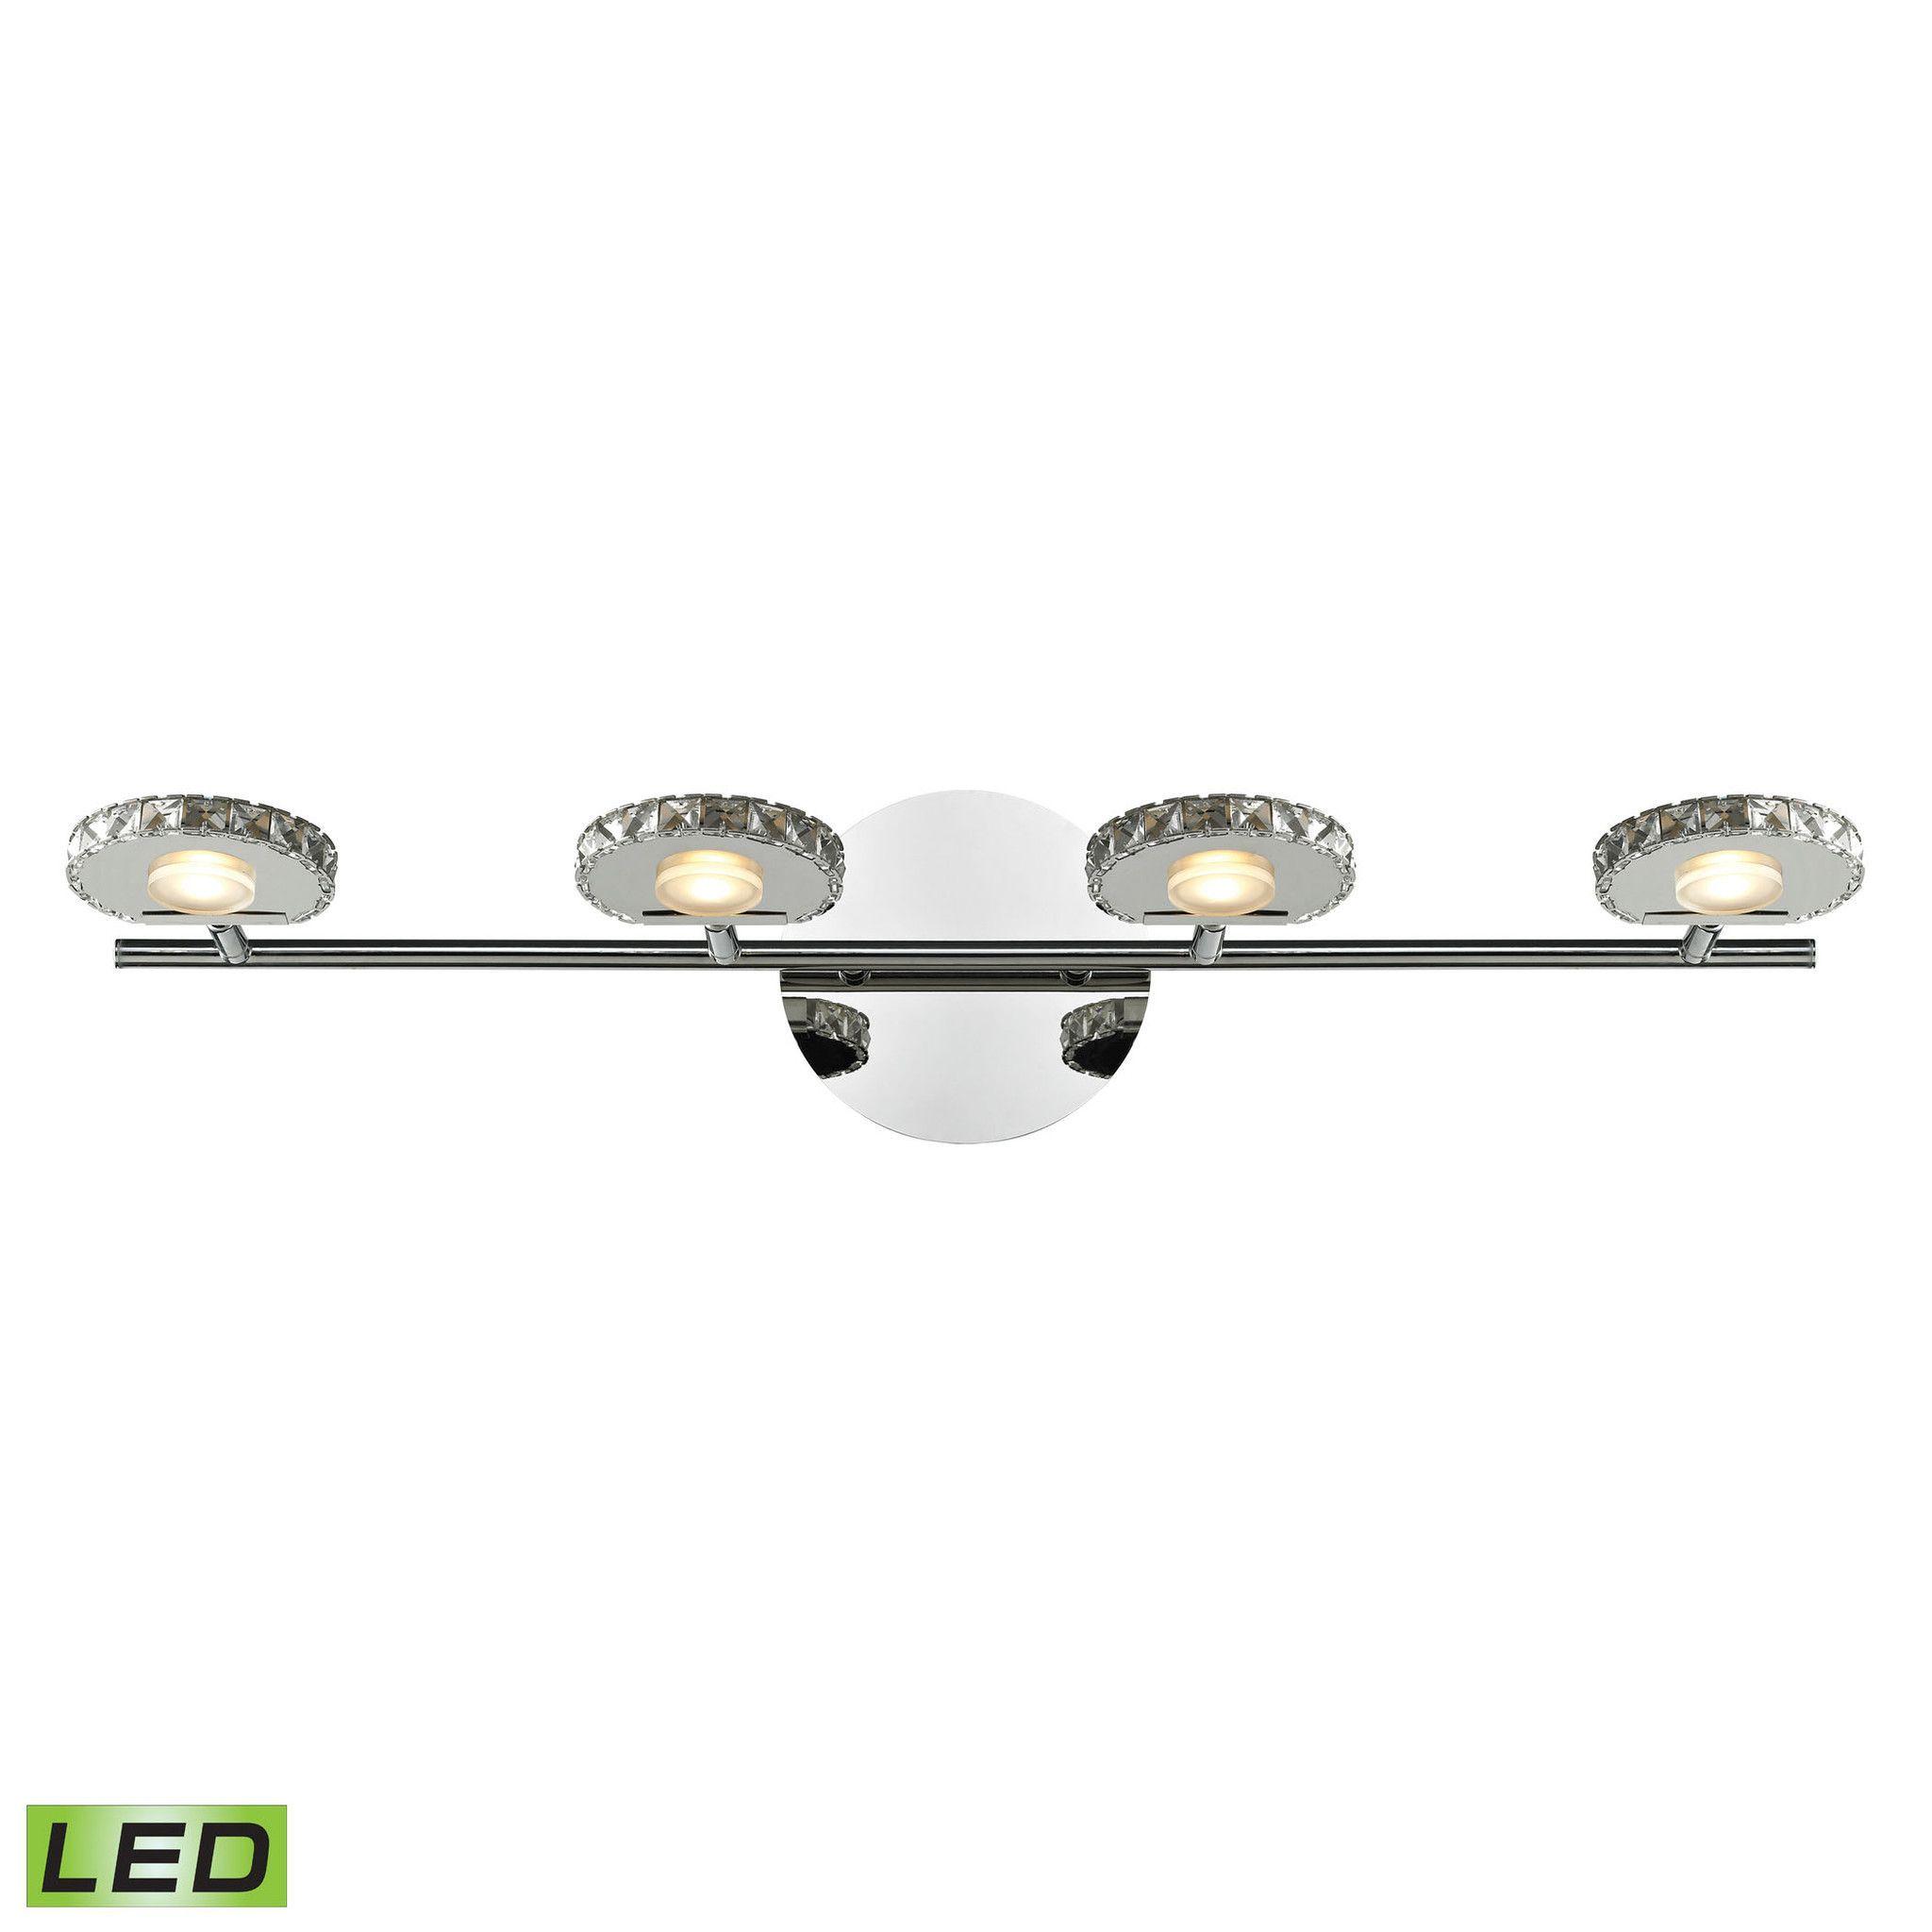 ELK Lighting 54003/4 Spiva Collection Polished Chrome Finish